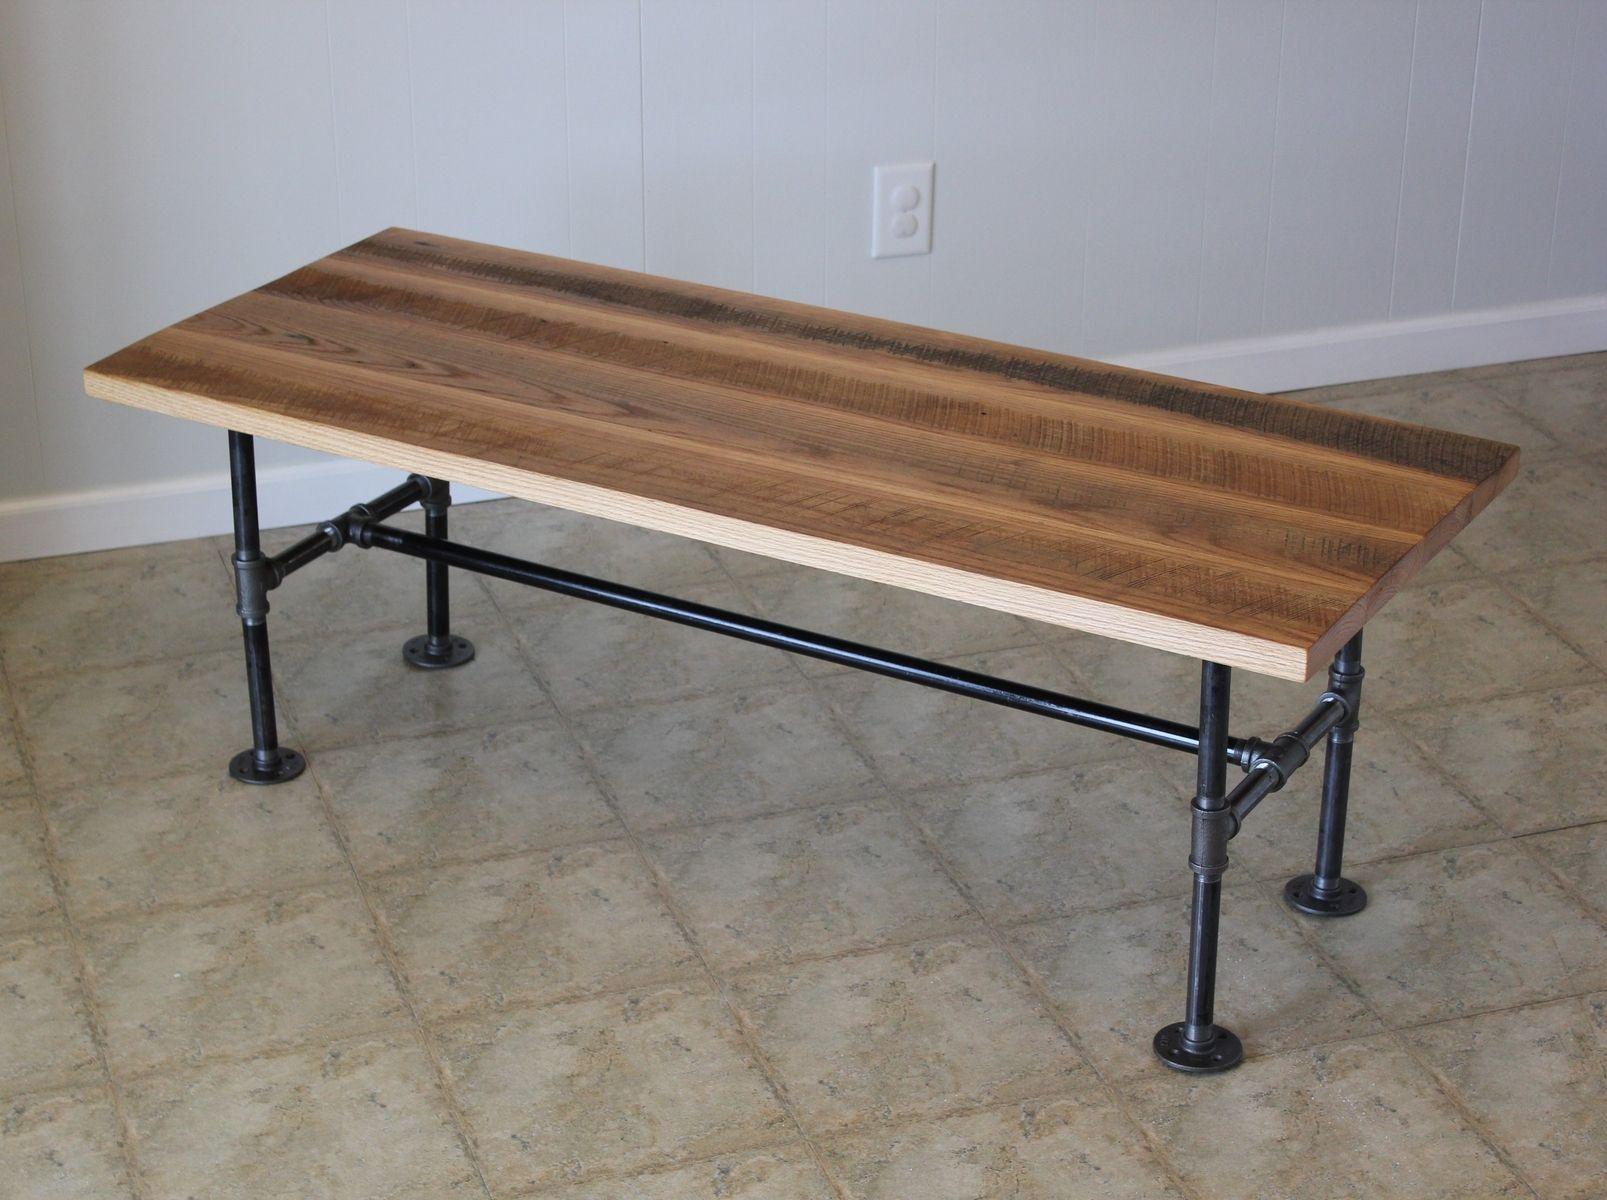 Custom Reclaimed Barn Wood Coffee Table With Industrial